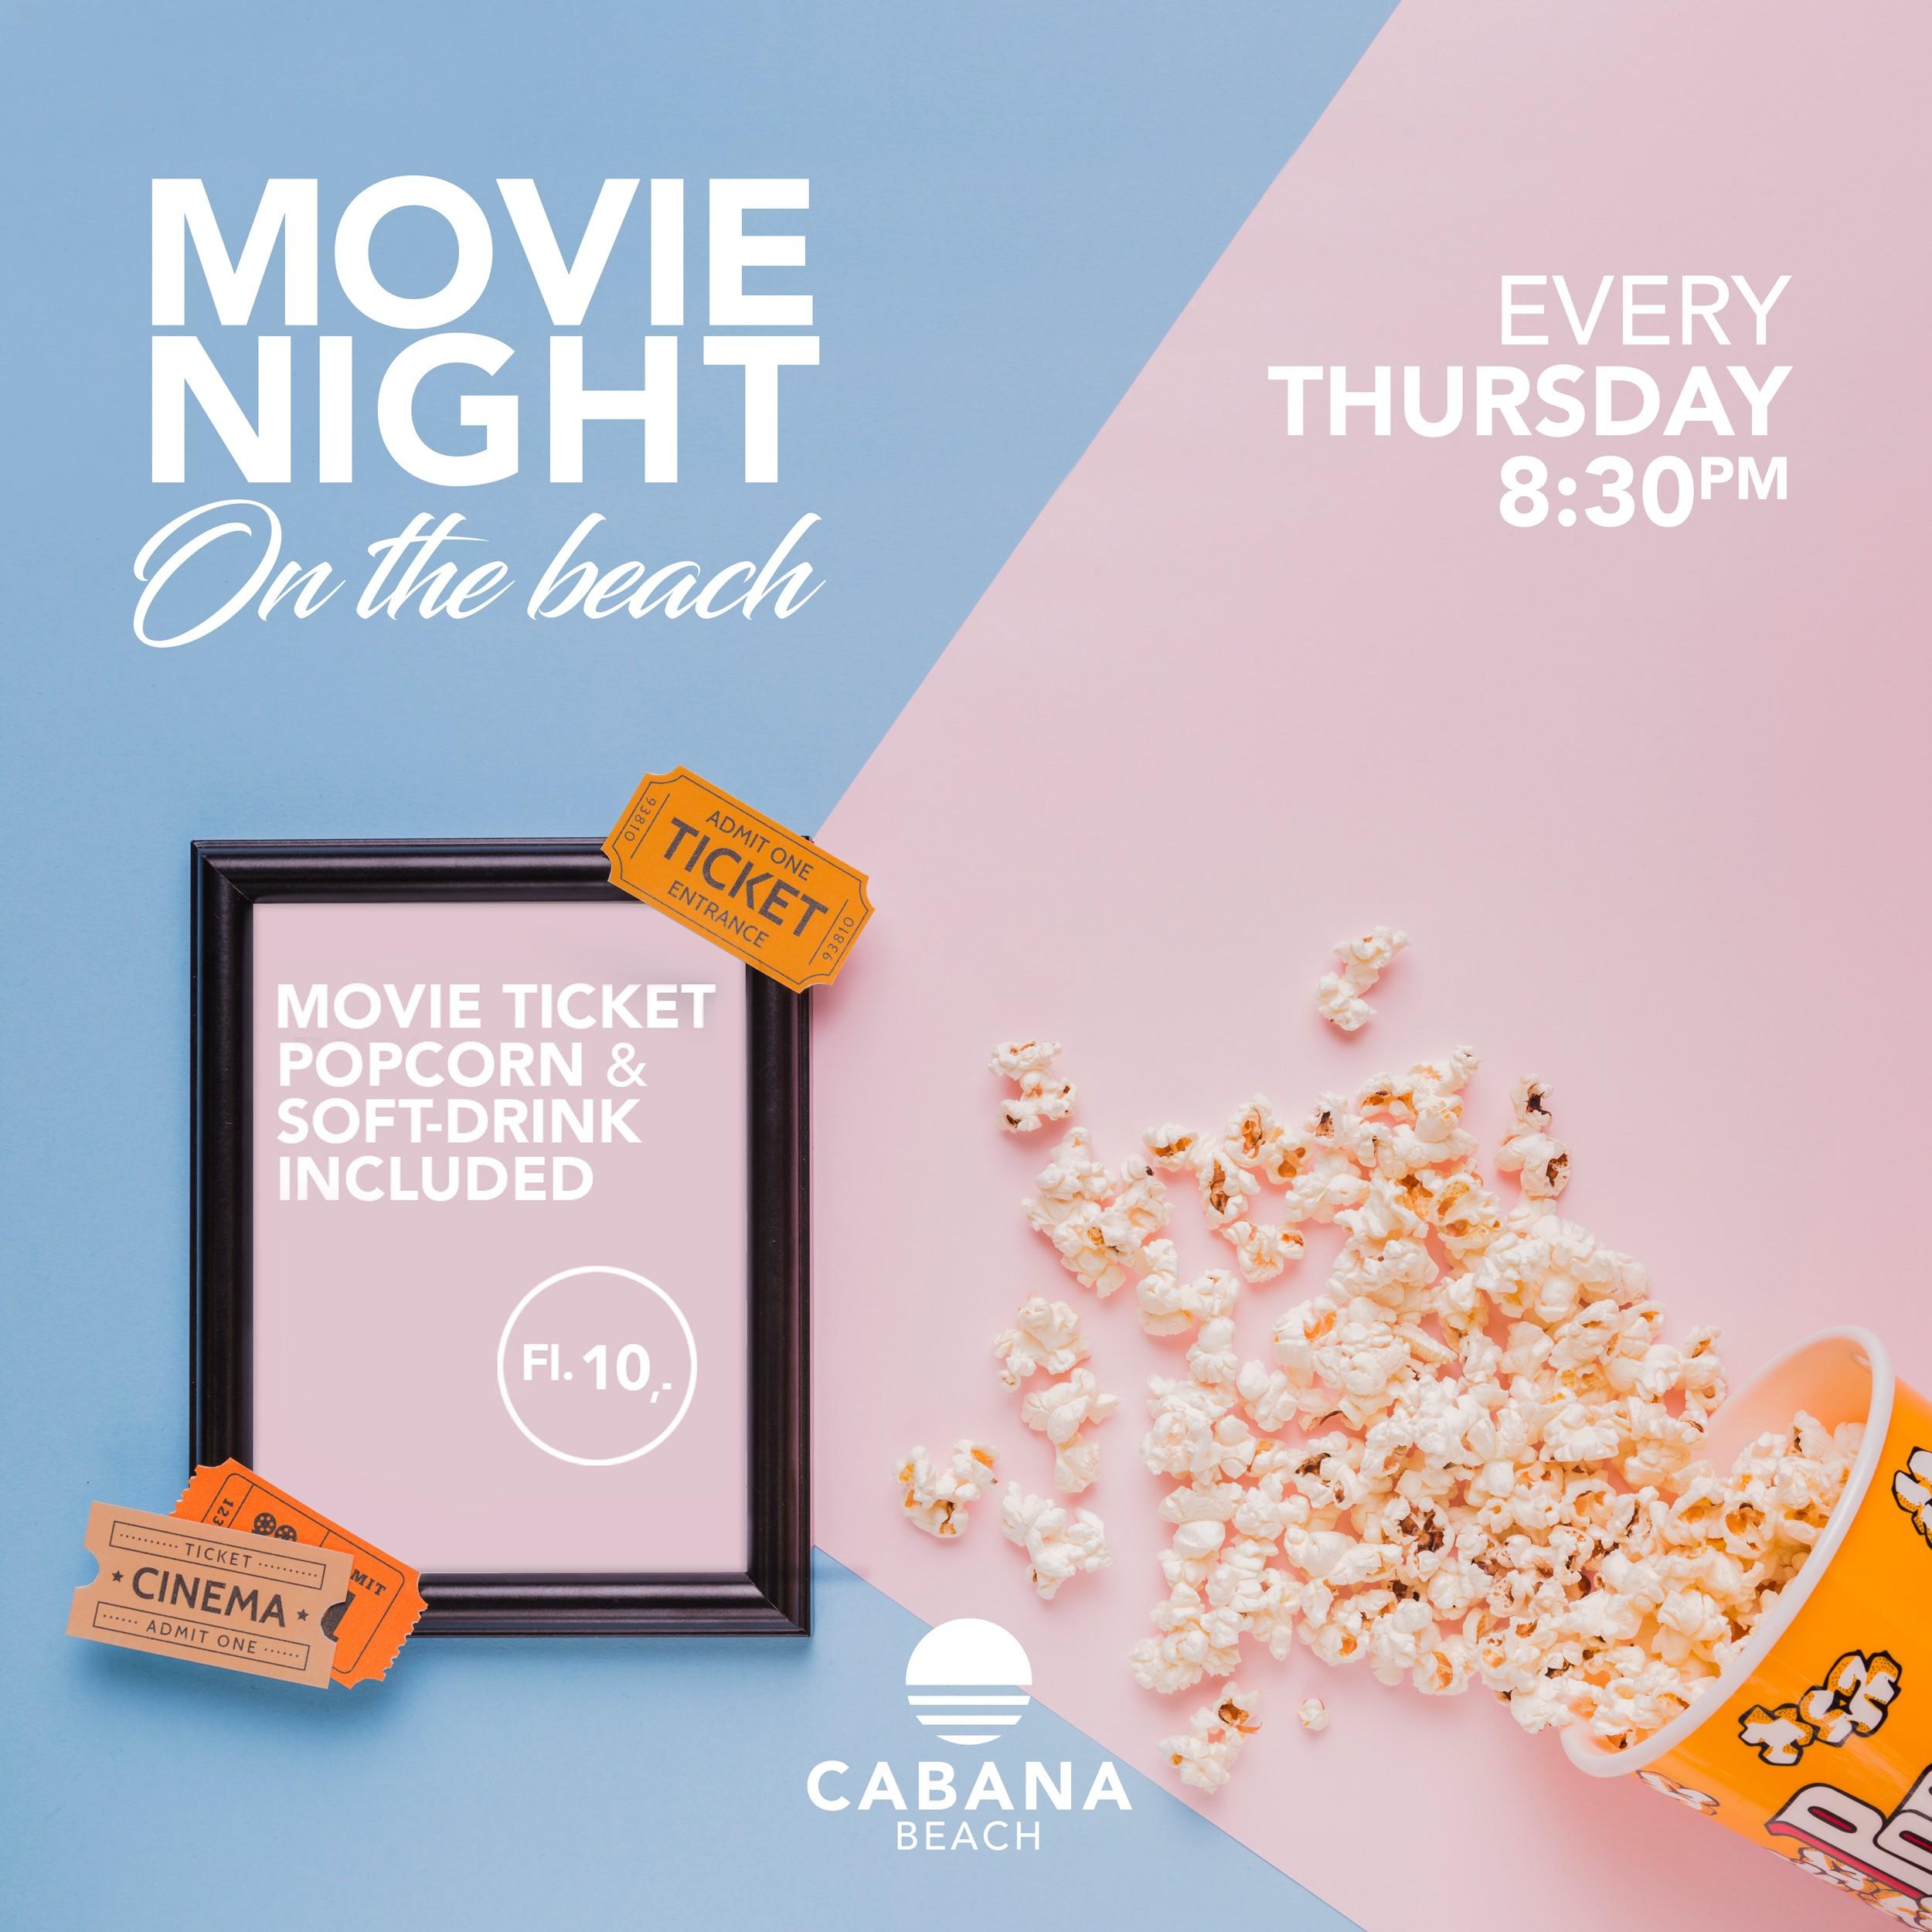 Movie Night Thursday